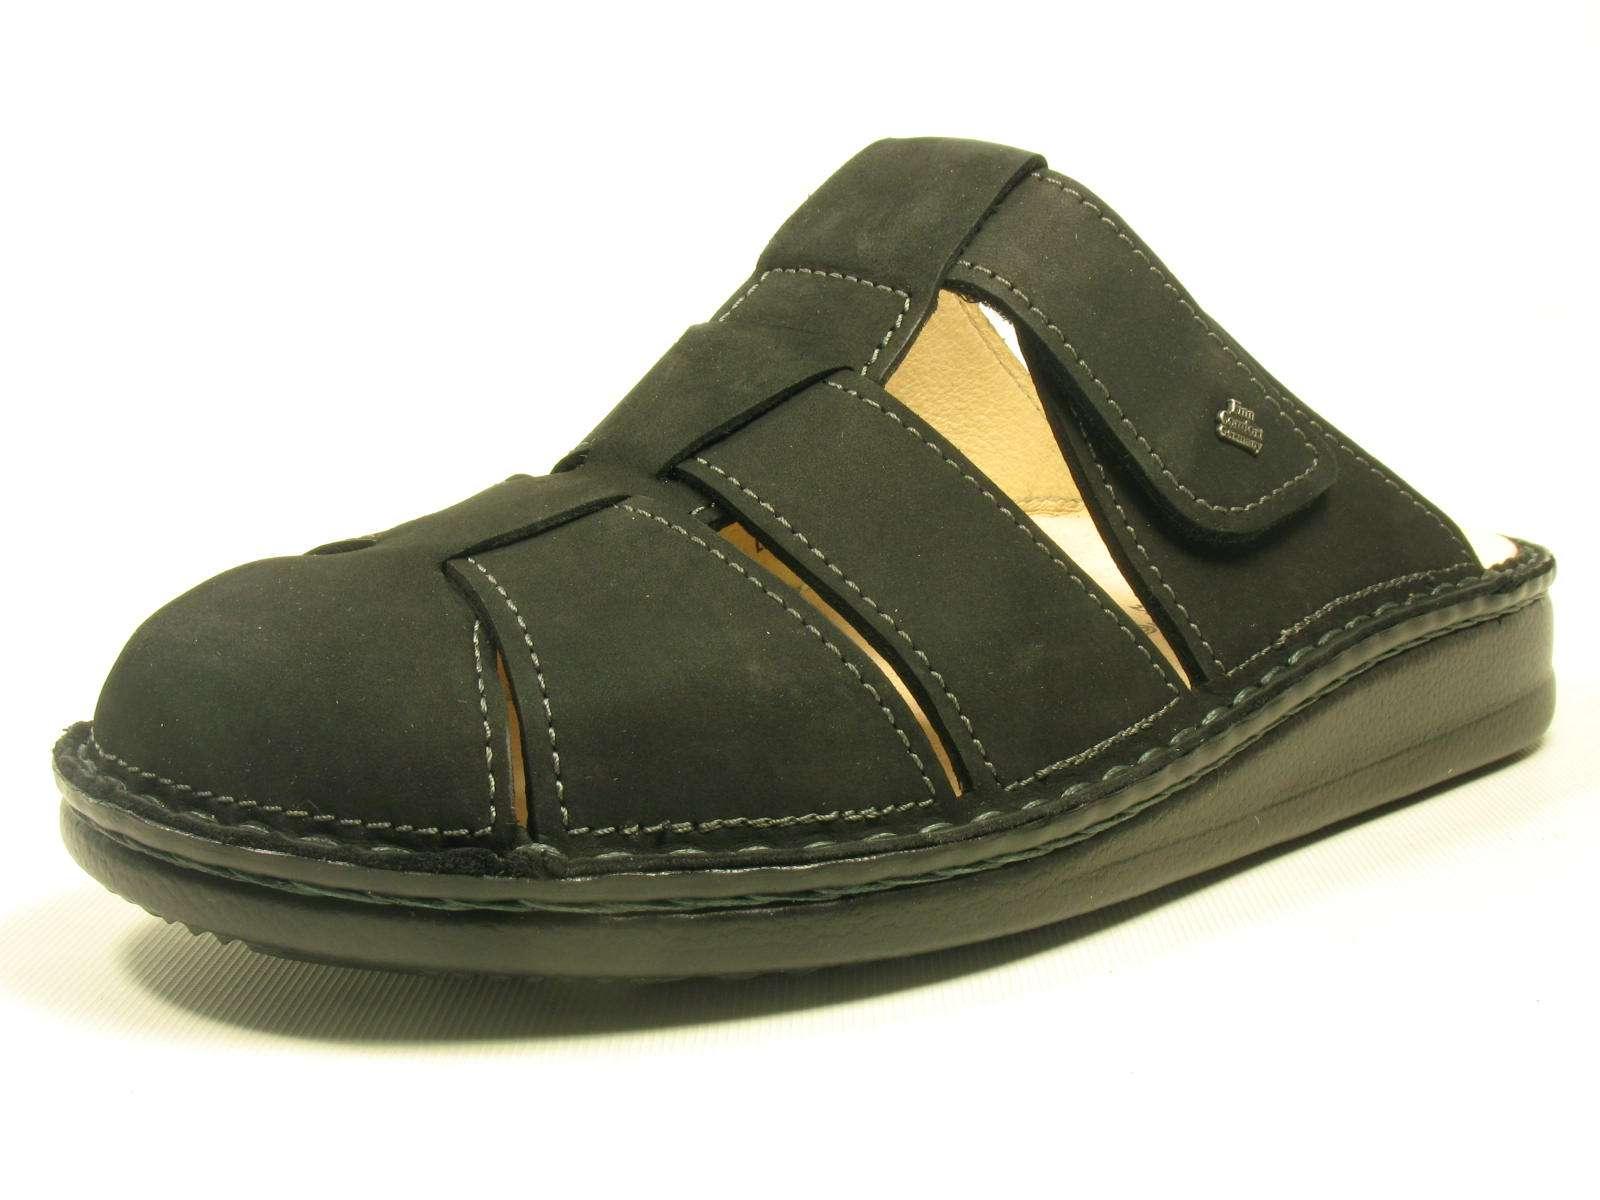 Schuhe Bequem